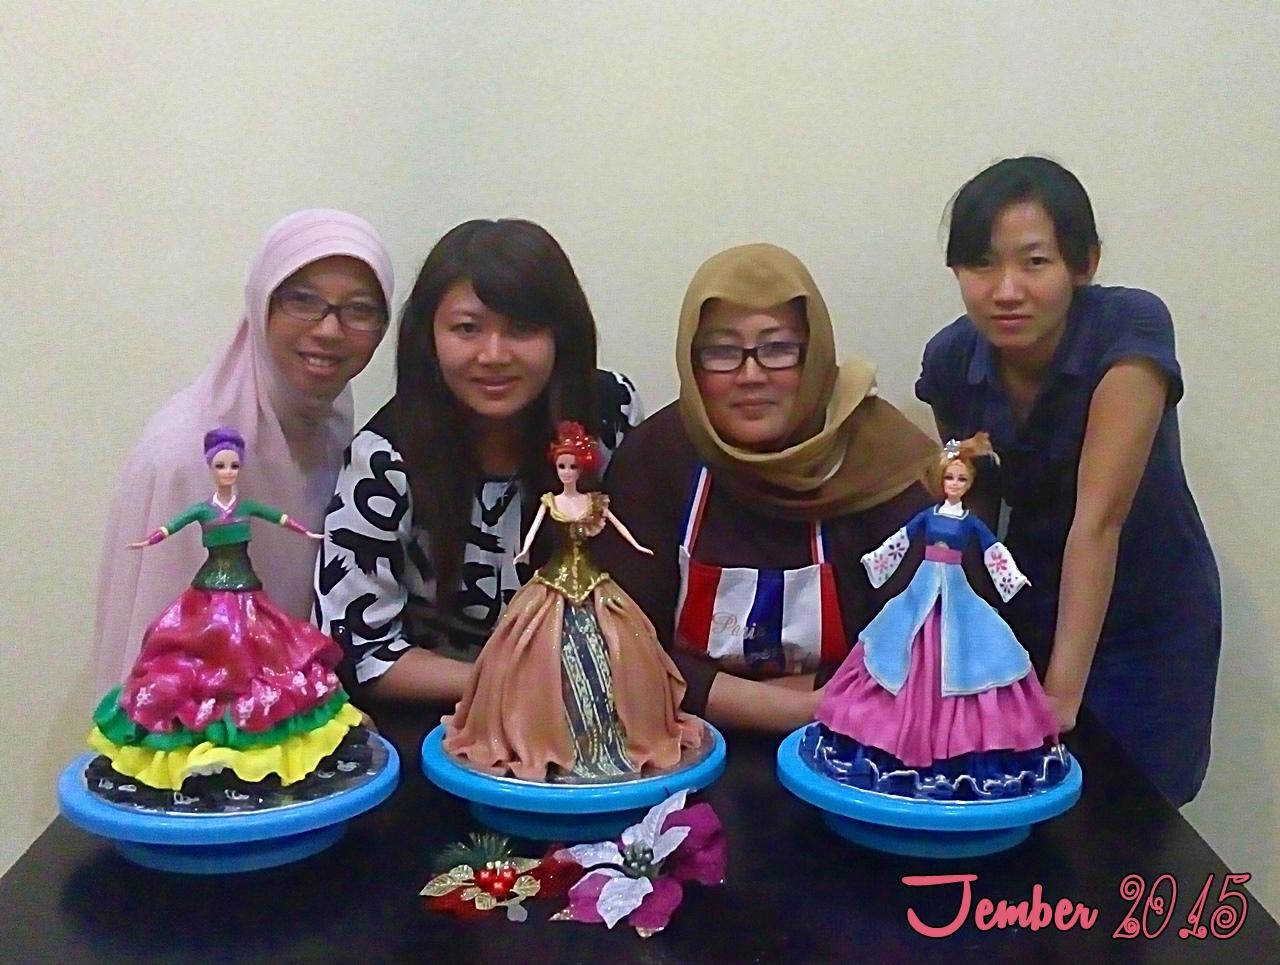 Jember Doll CakeCourse